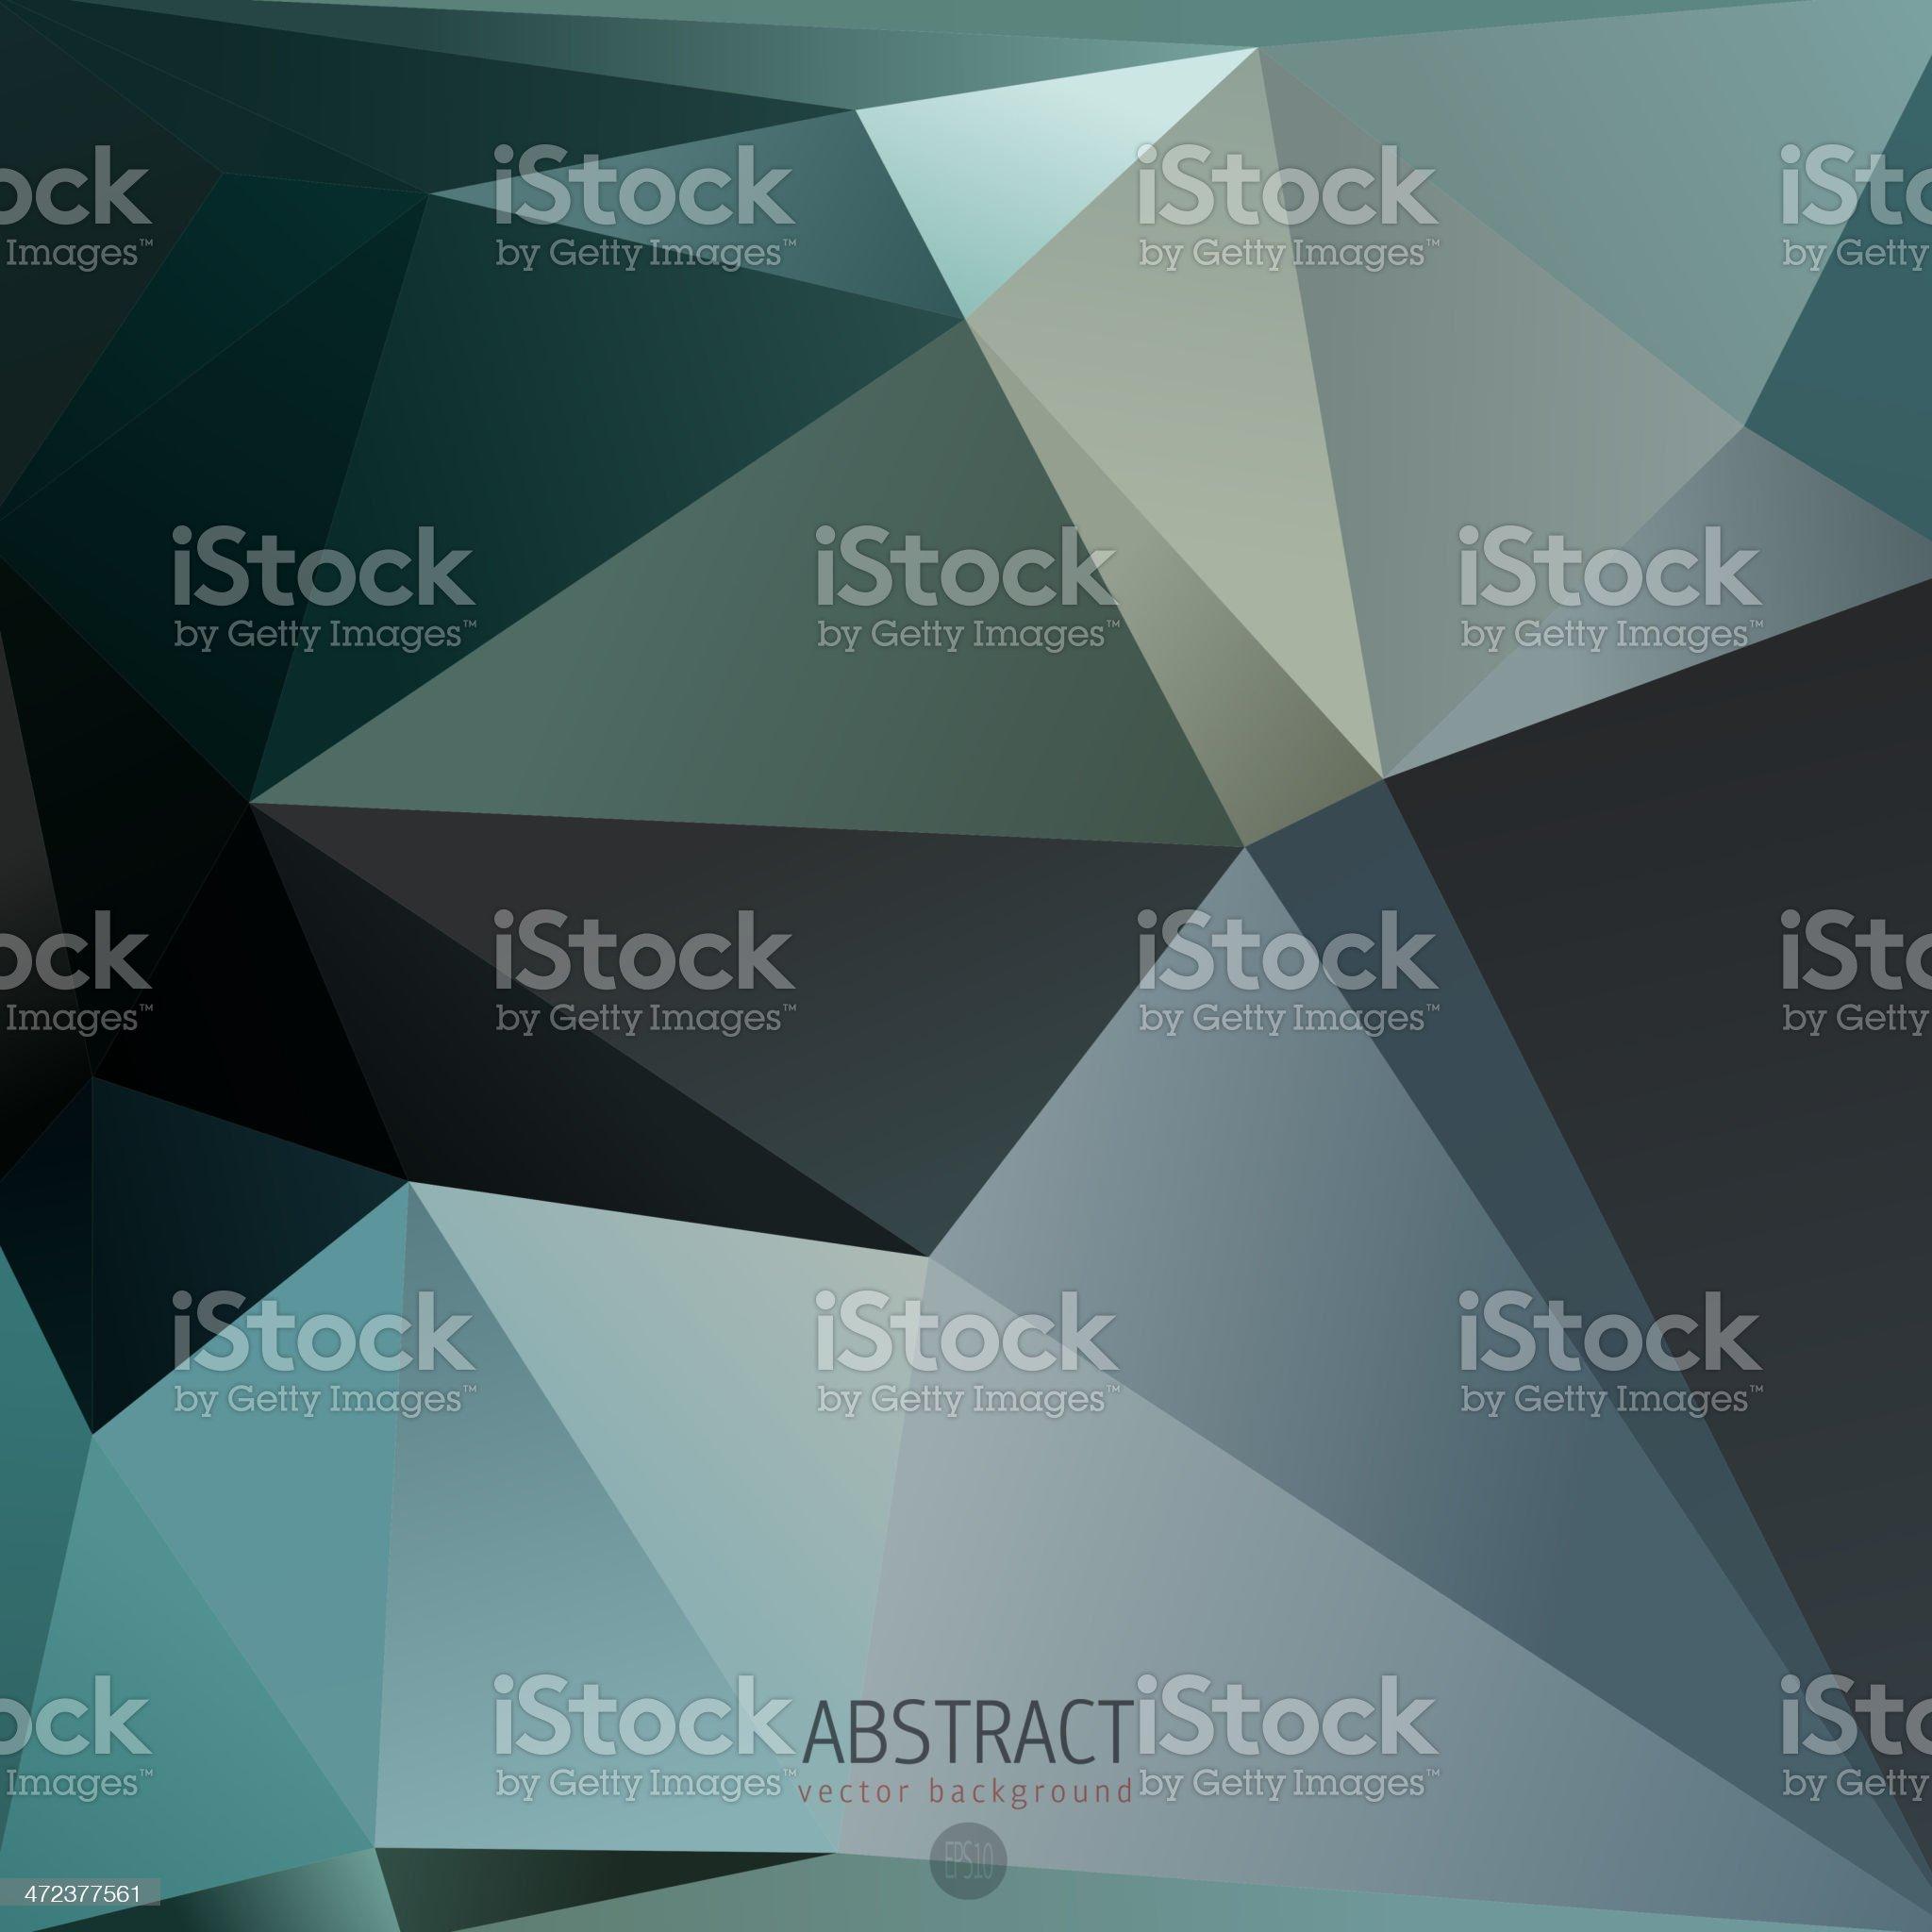 Dark Mosaic triangle background royalty-free stock vector art